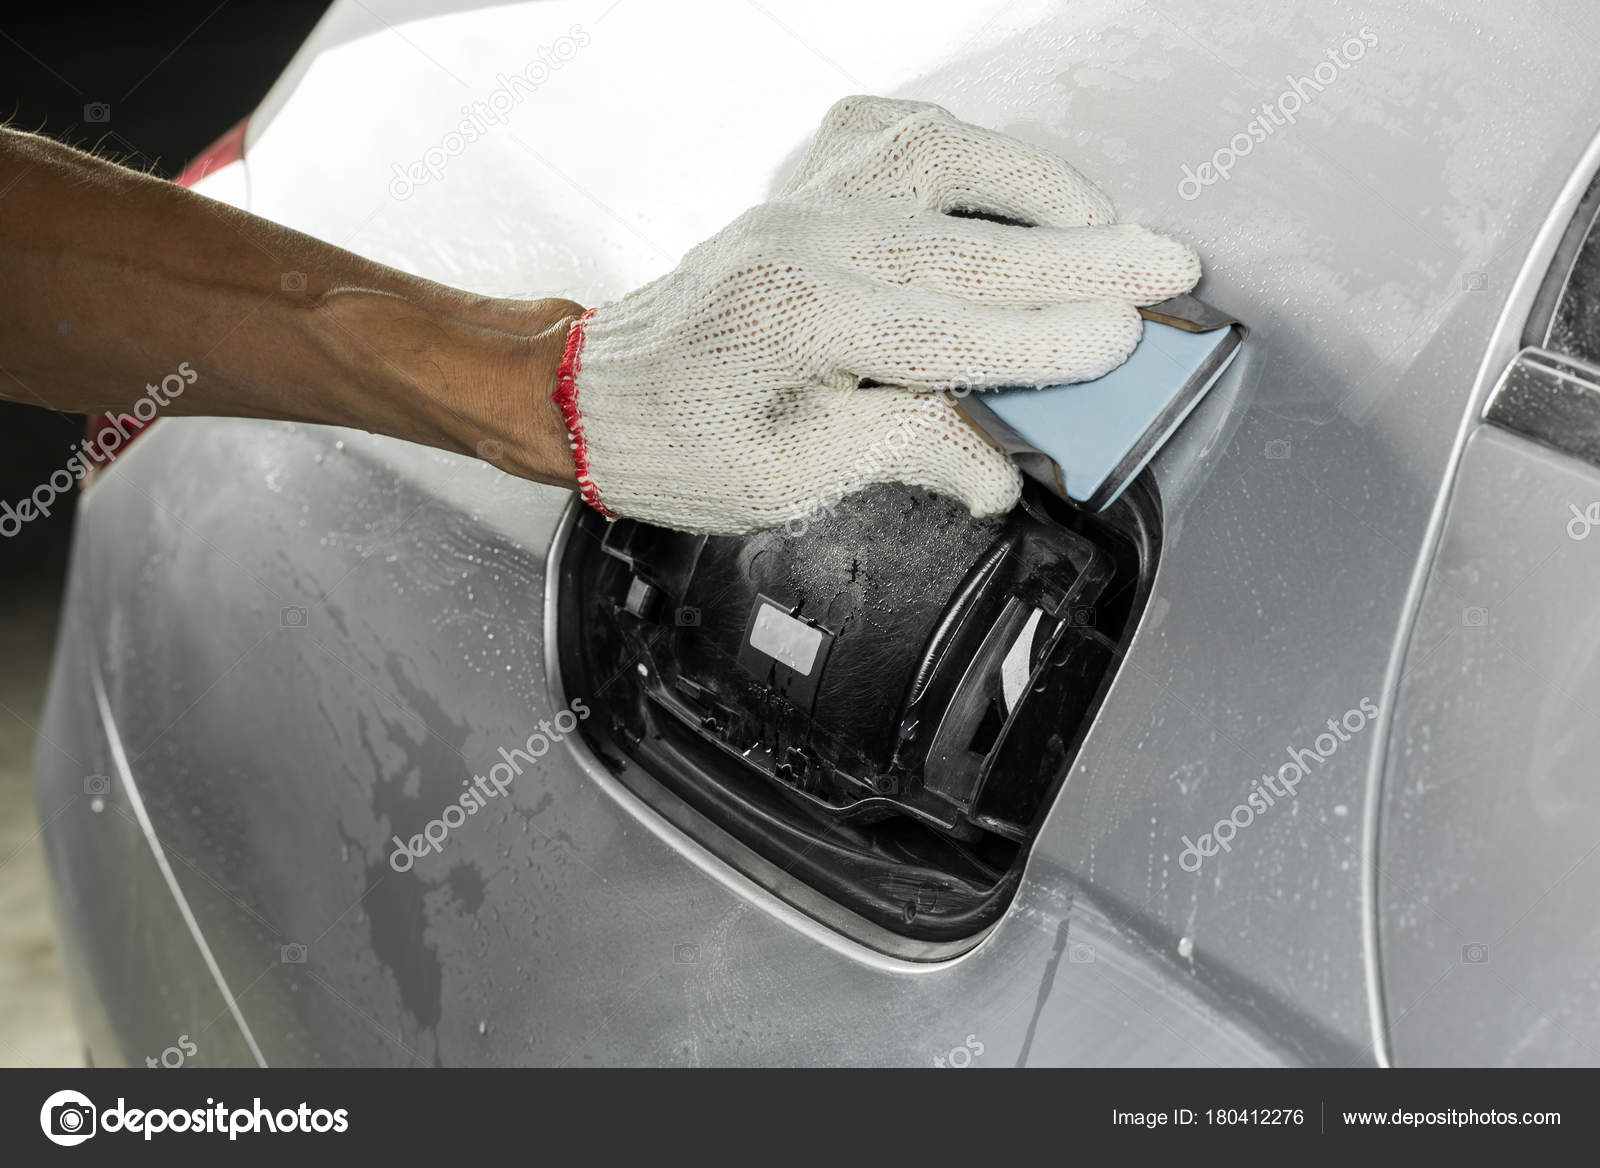 Auto Body Repair Series Wet Sanding Car Paint Stock Photo